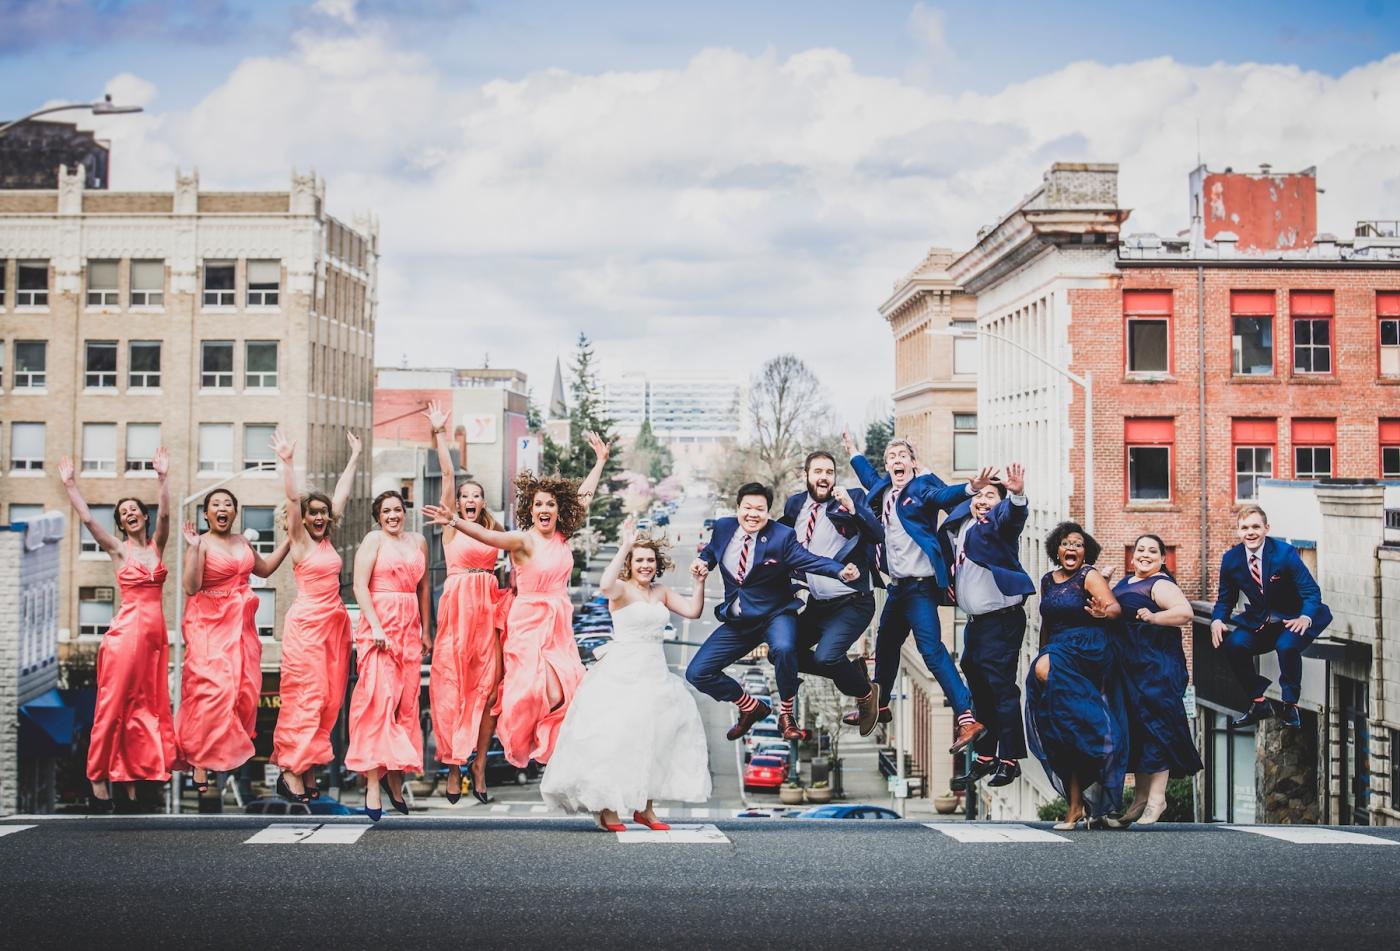 DSC_2265Everett_Wedding_Ballroom_Jane_Speleers_photography_Rachel_and_Edmund_Bridesmaids_peach_dresses_groomsmen_2017